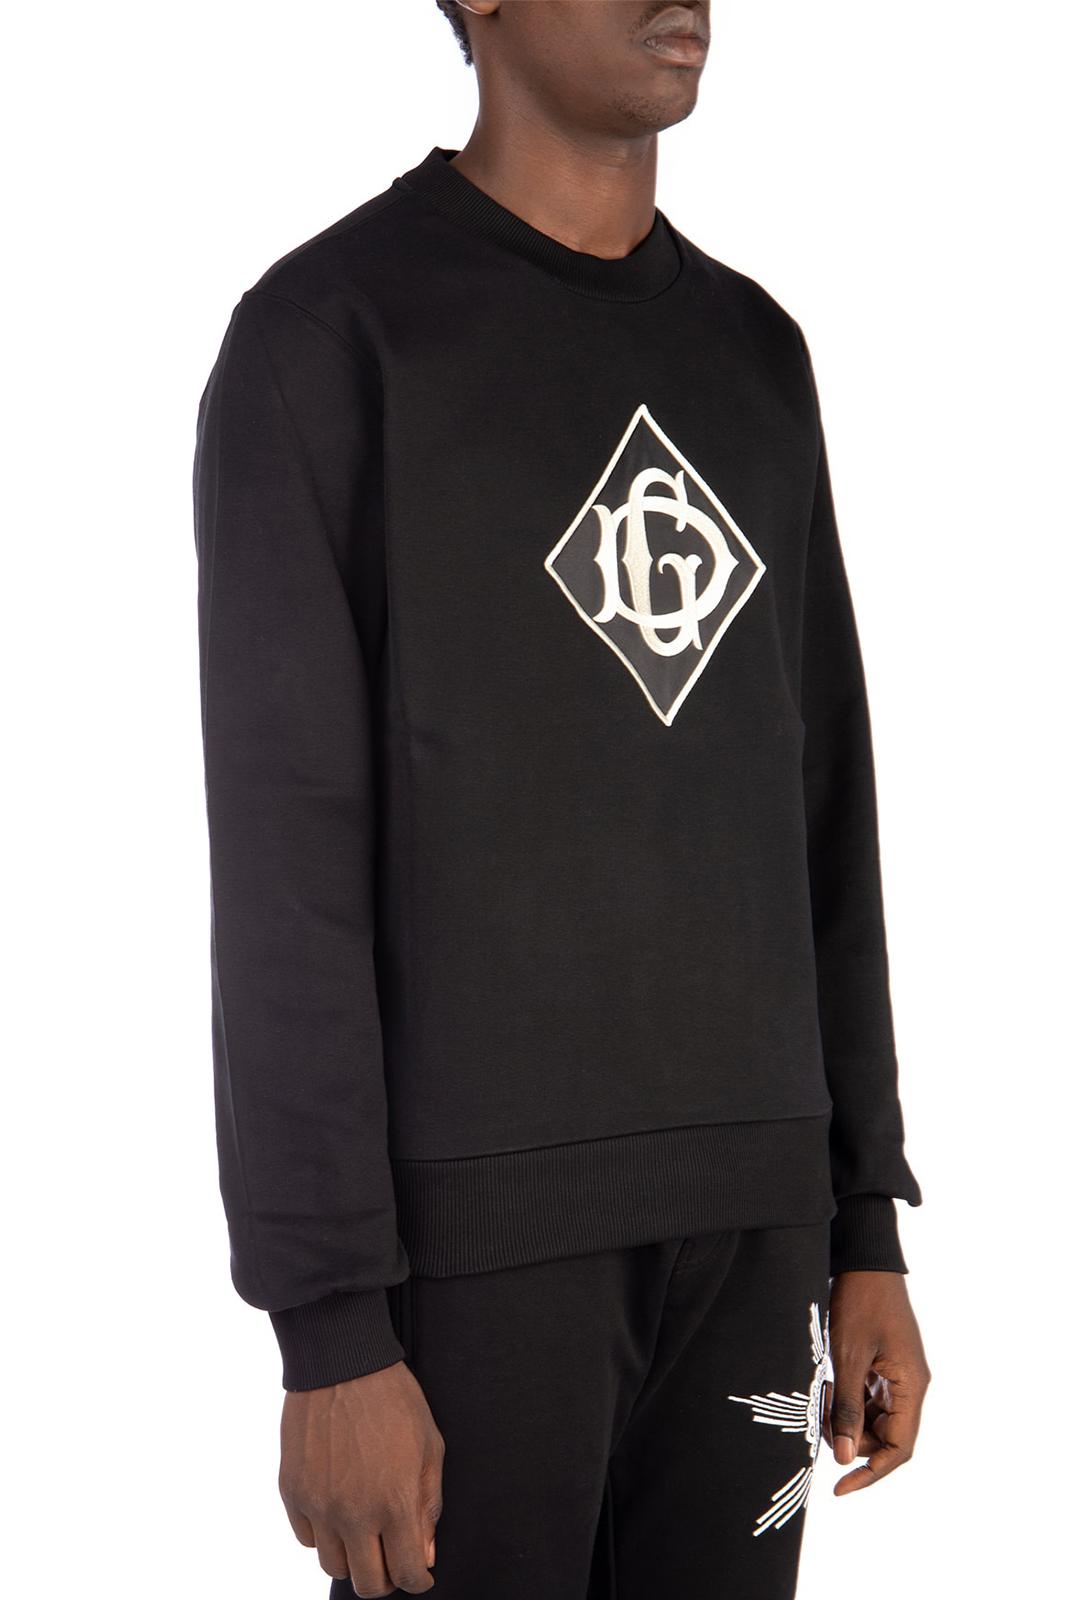 Sweatshirts  Dolce&Gabbana G9OW6Z N0000 BLACK